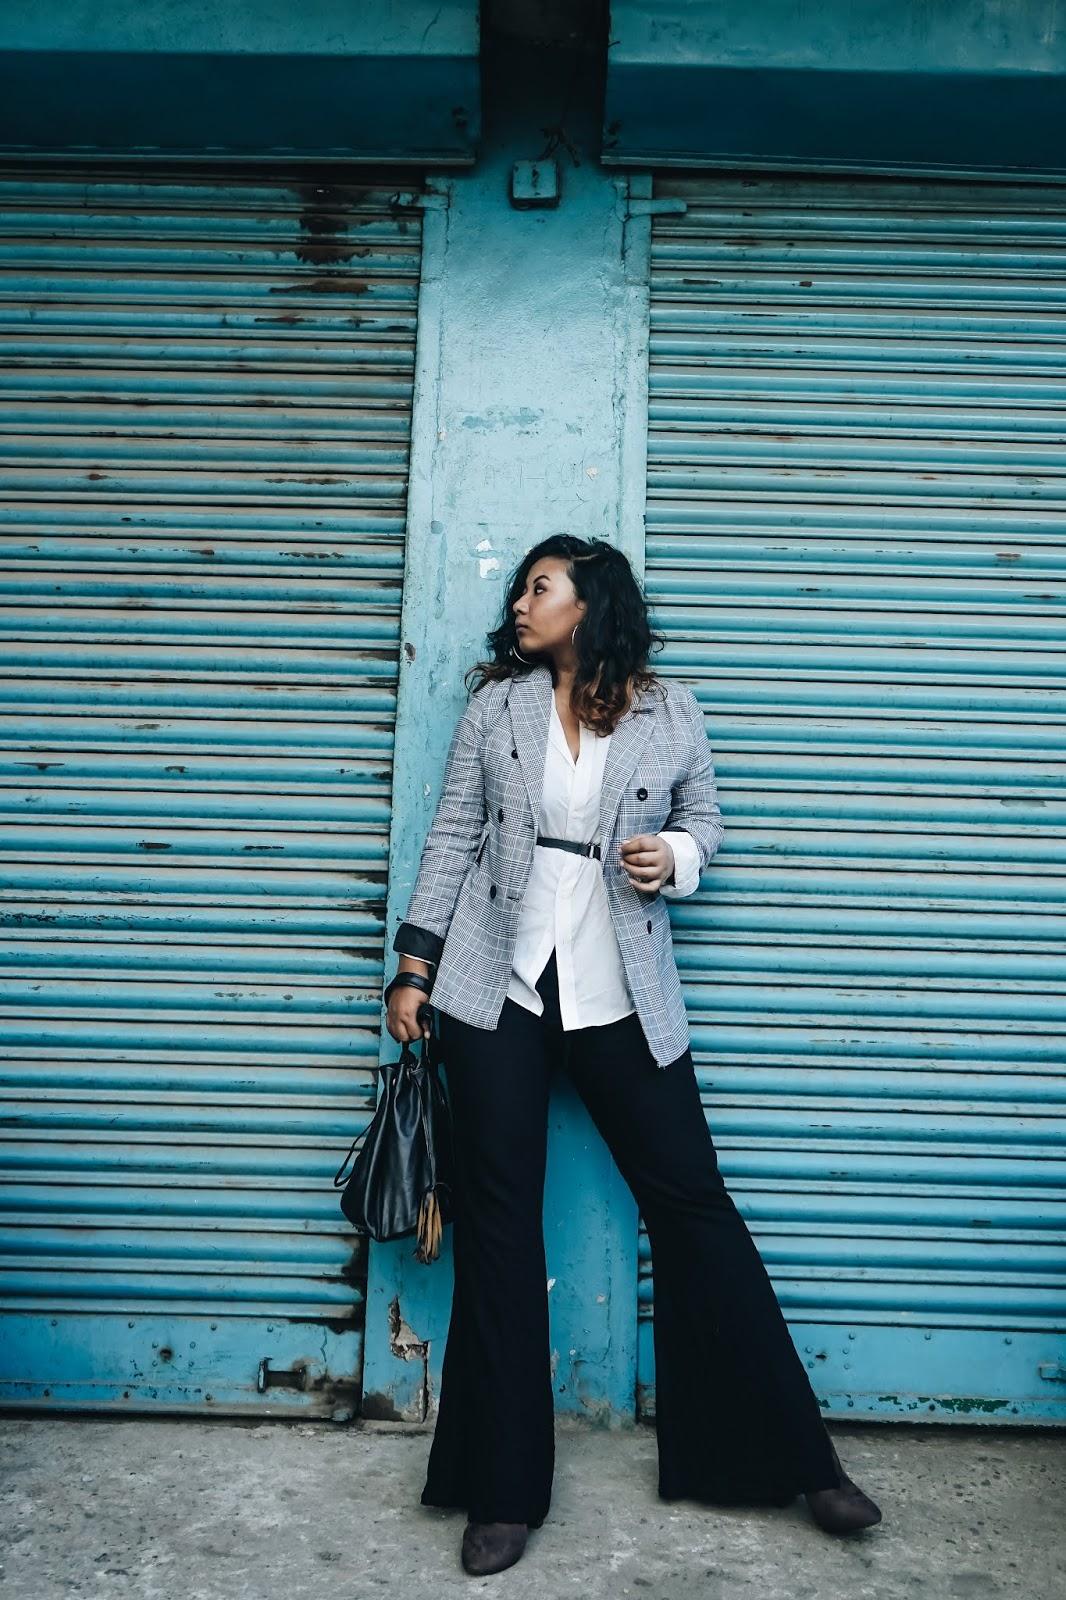 SelestyMe Indian fashion blog by Chayanika Rabha, Indianfashionblogger, Streetstyle, Guwahati top blogger, Top blogger Indian, Instagram@selestyme